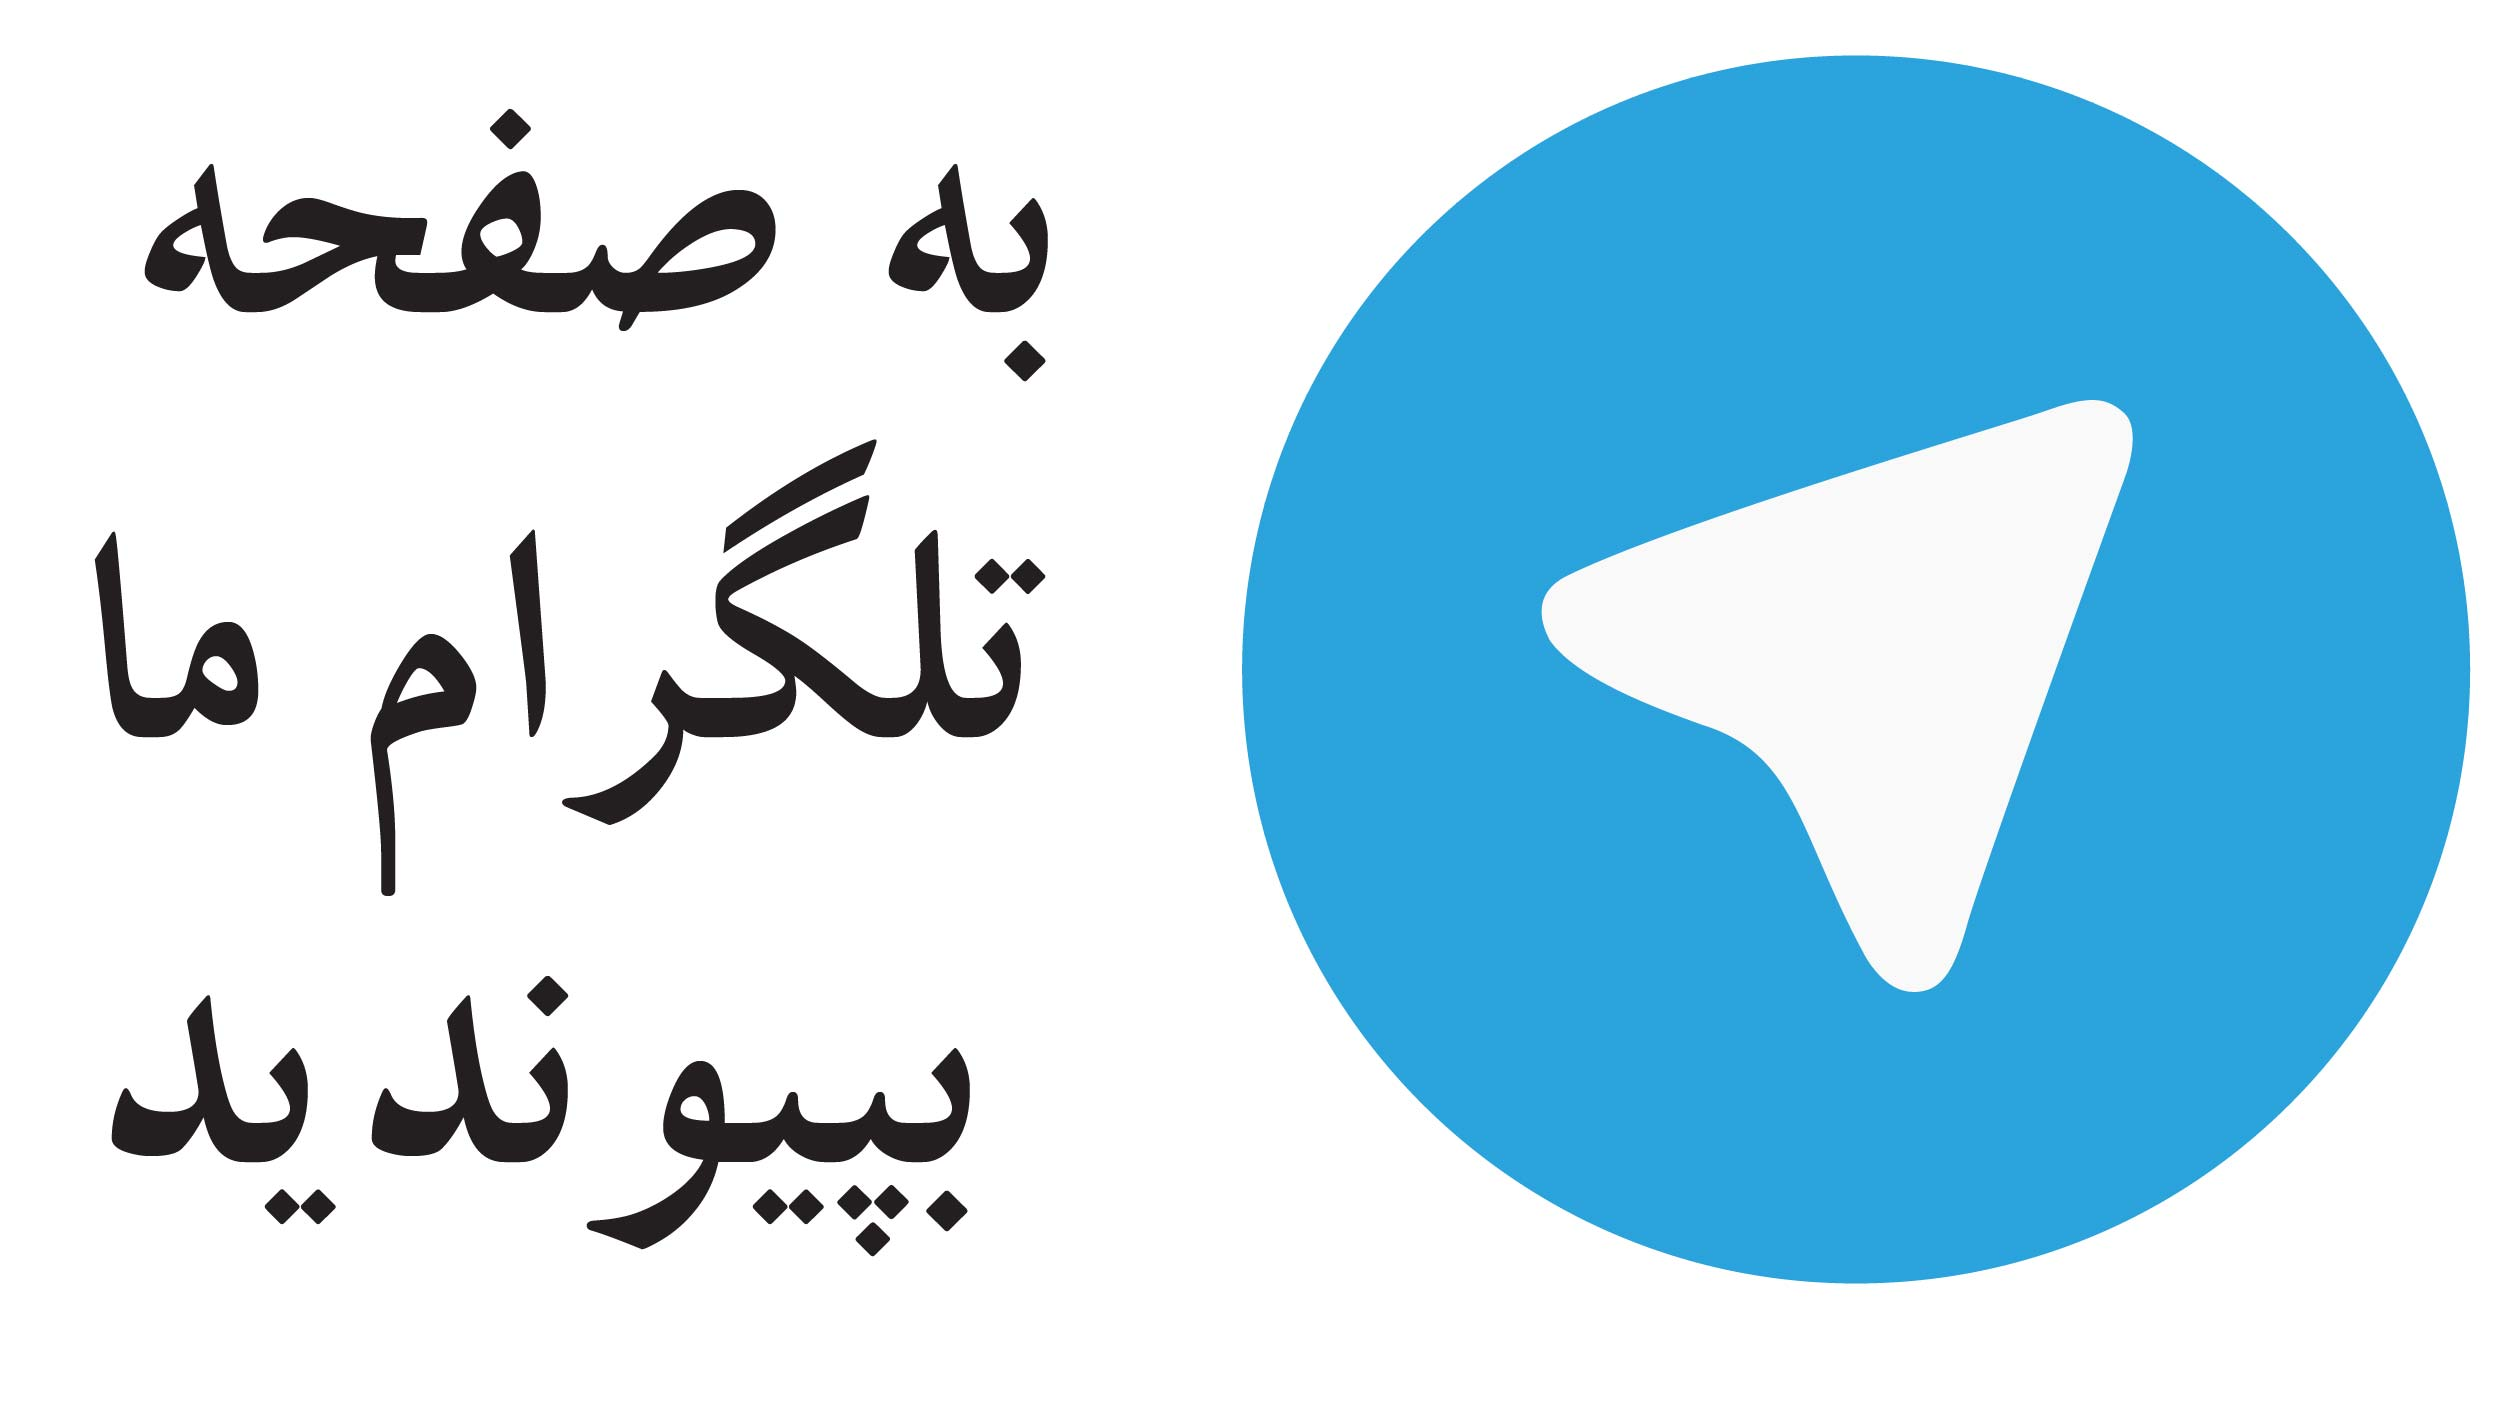 کانال تلگرام لنز ناخن سارا